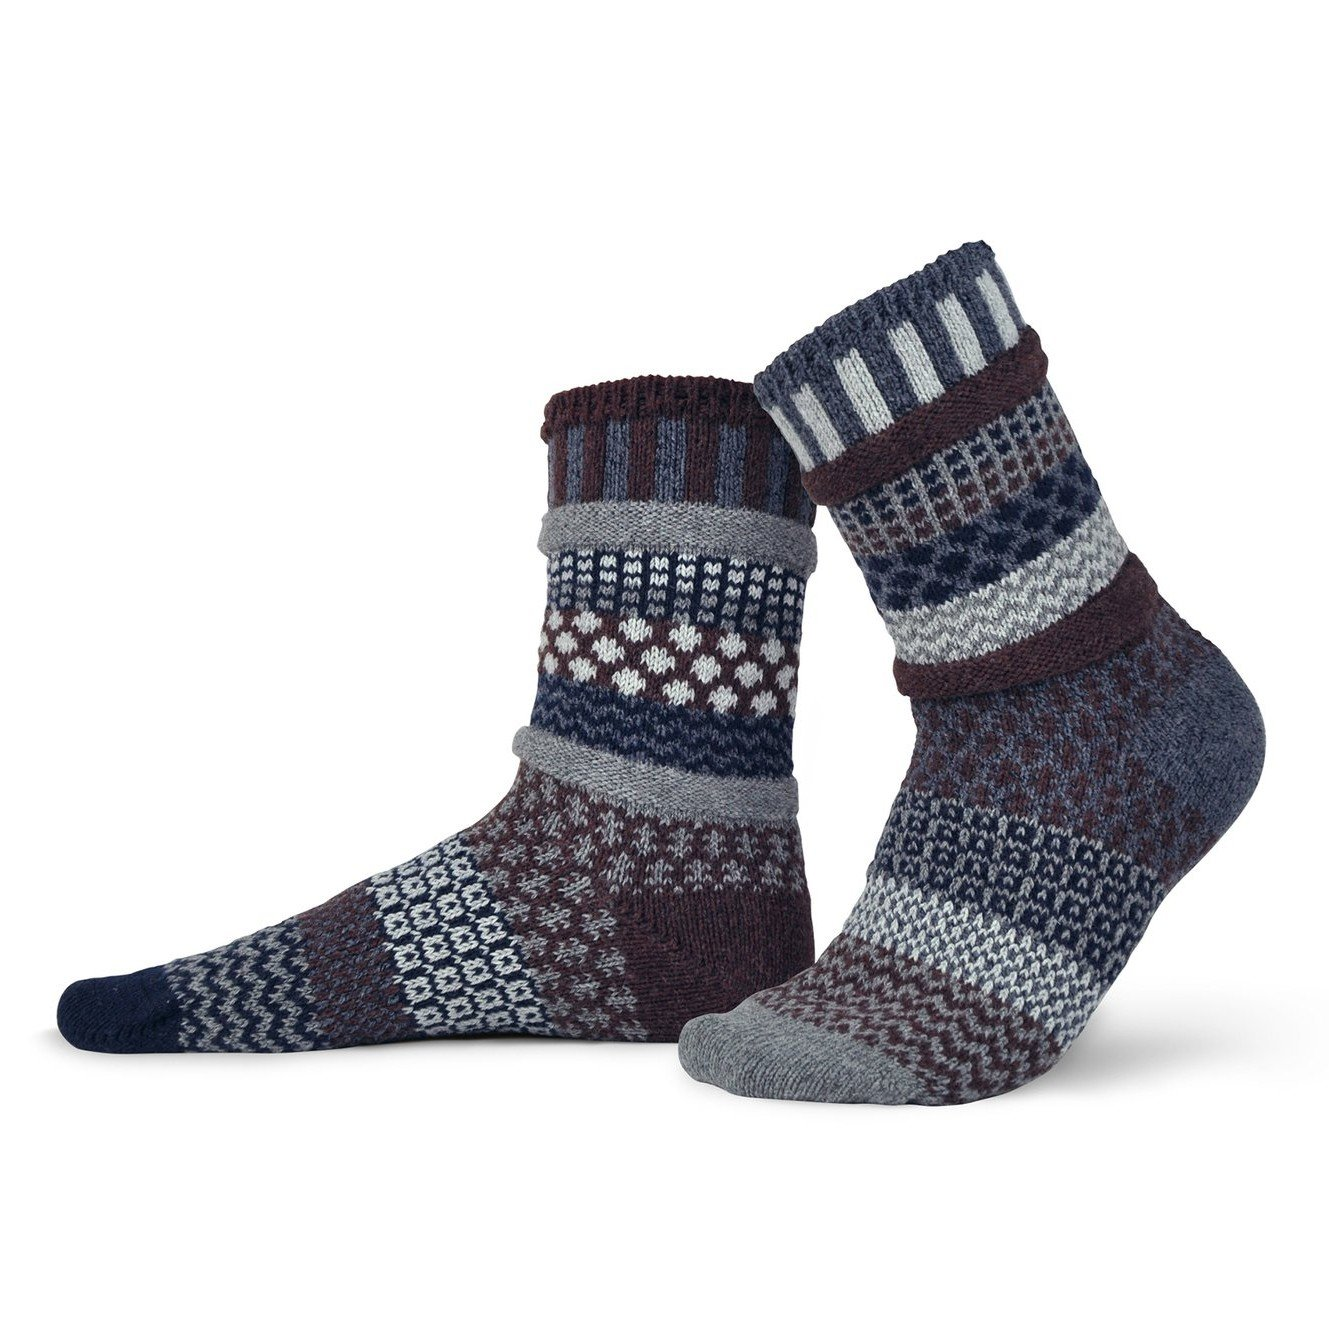 Mahogany Wool Adult Crew Socks